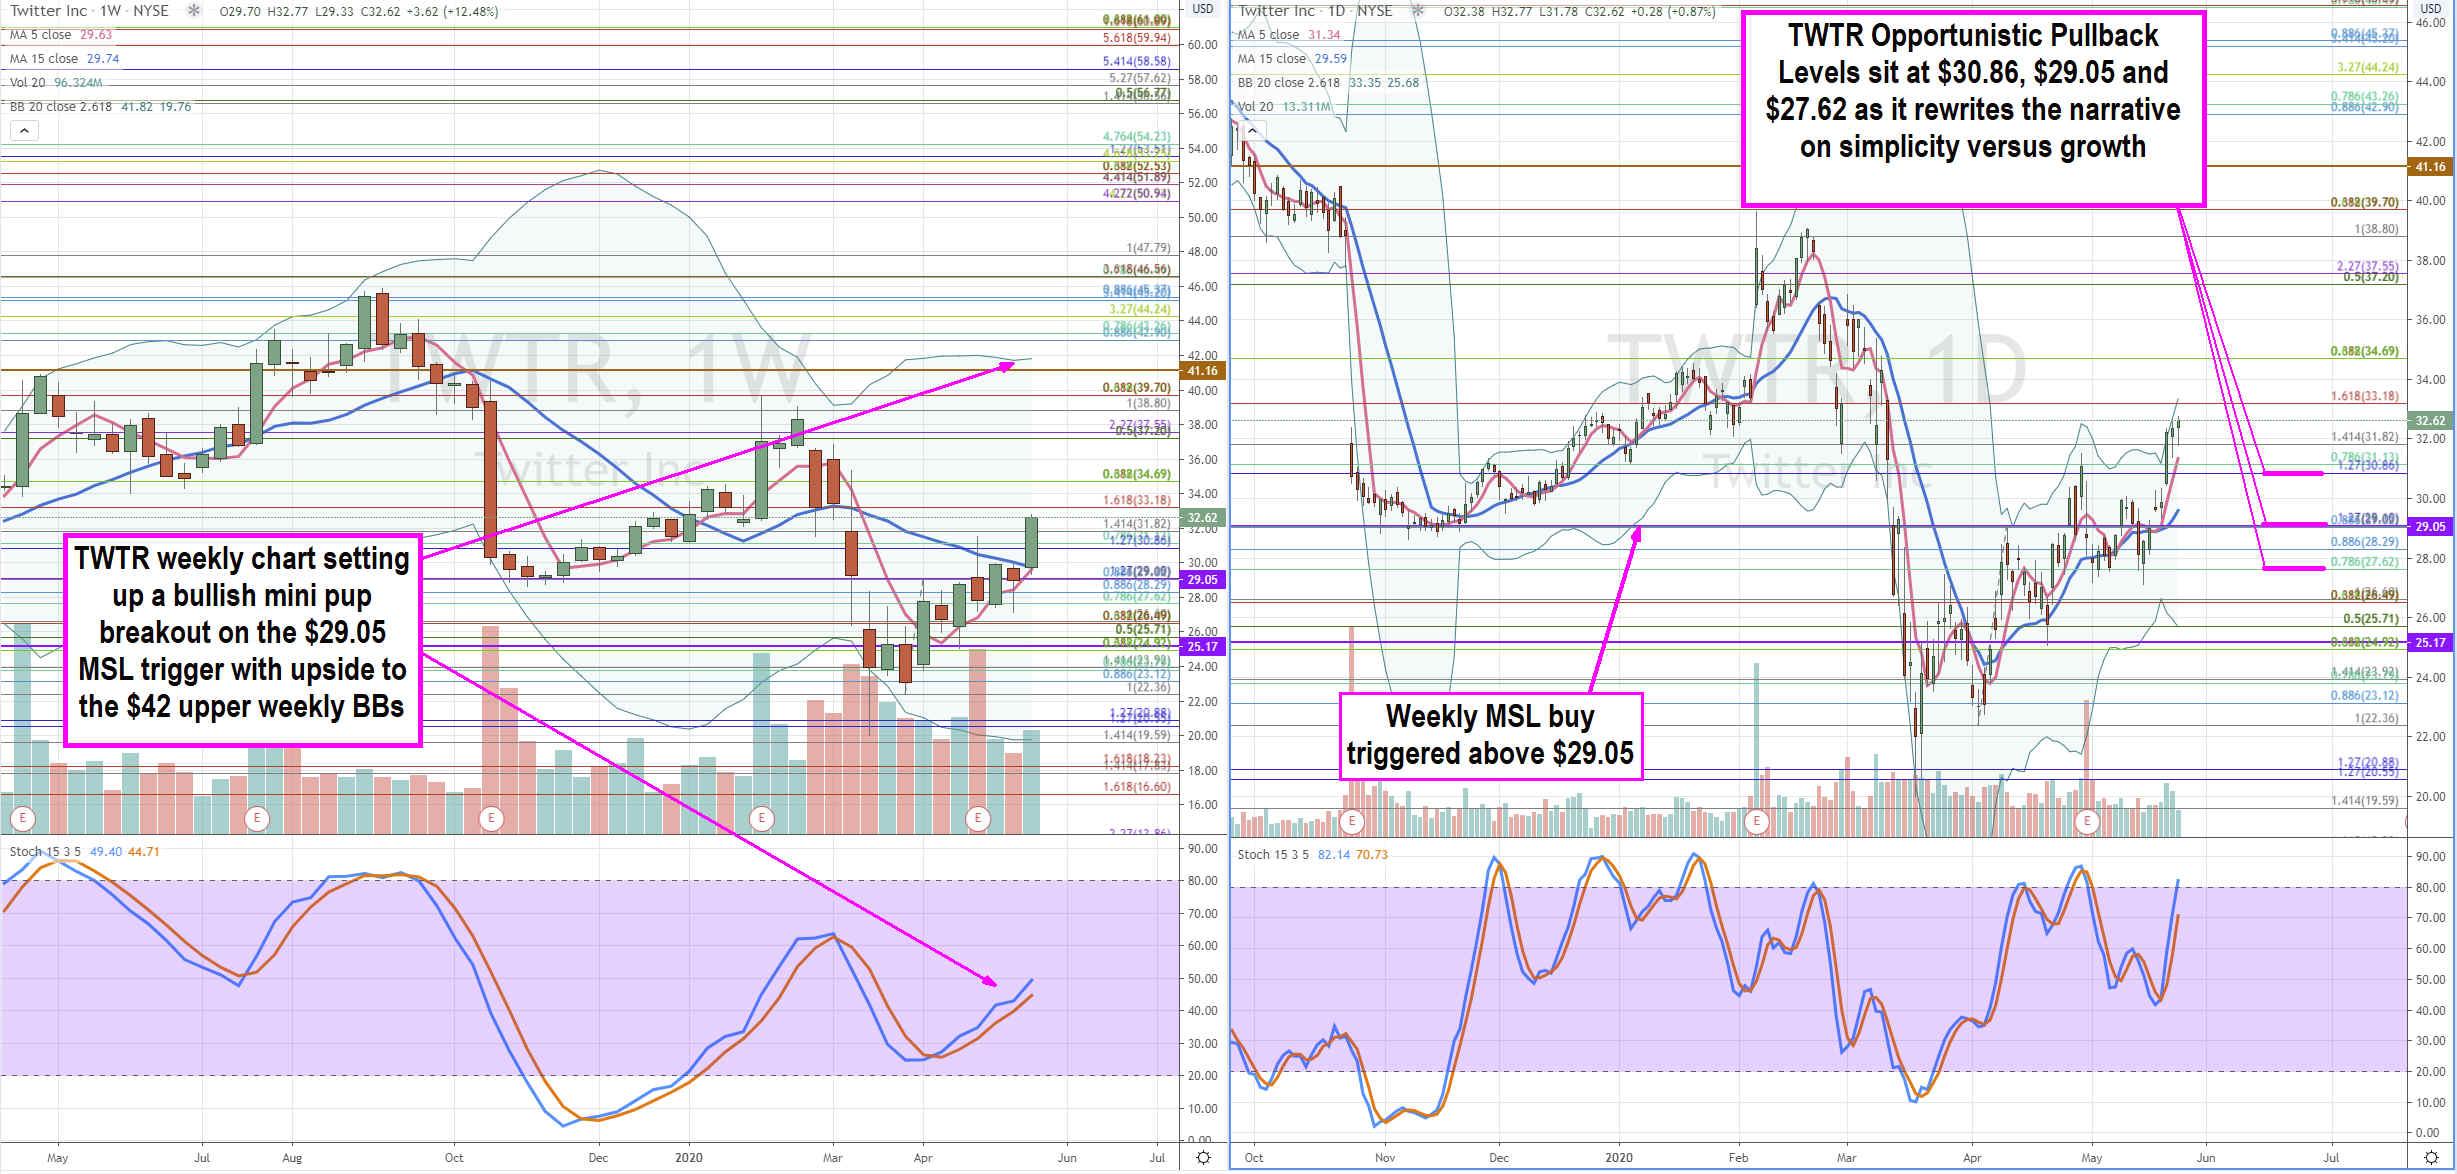 Twitter (NASDAQ: TWTR) Stock Developing into a Longer-Term Buy